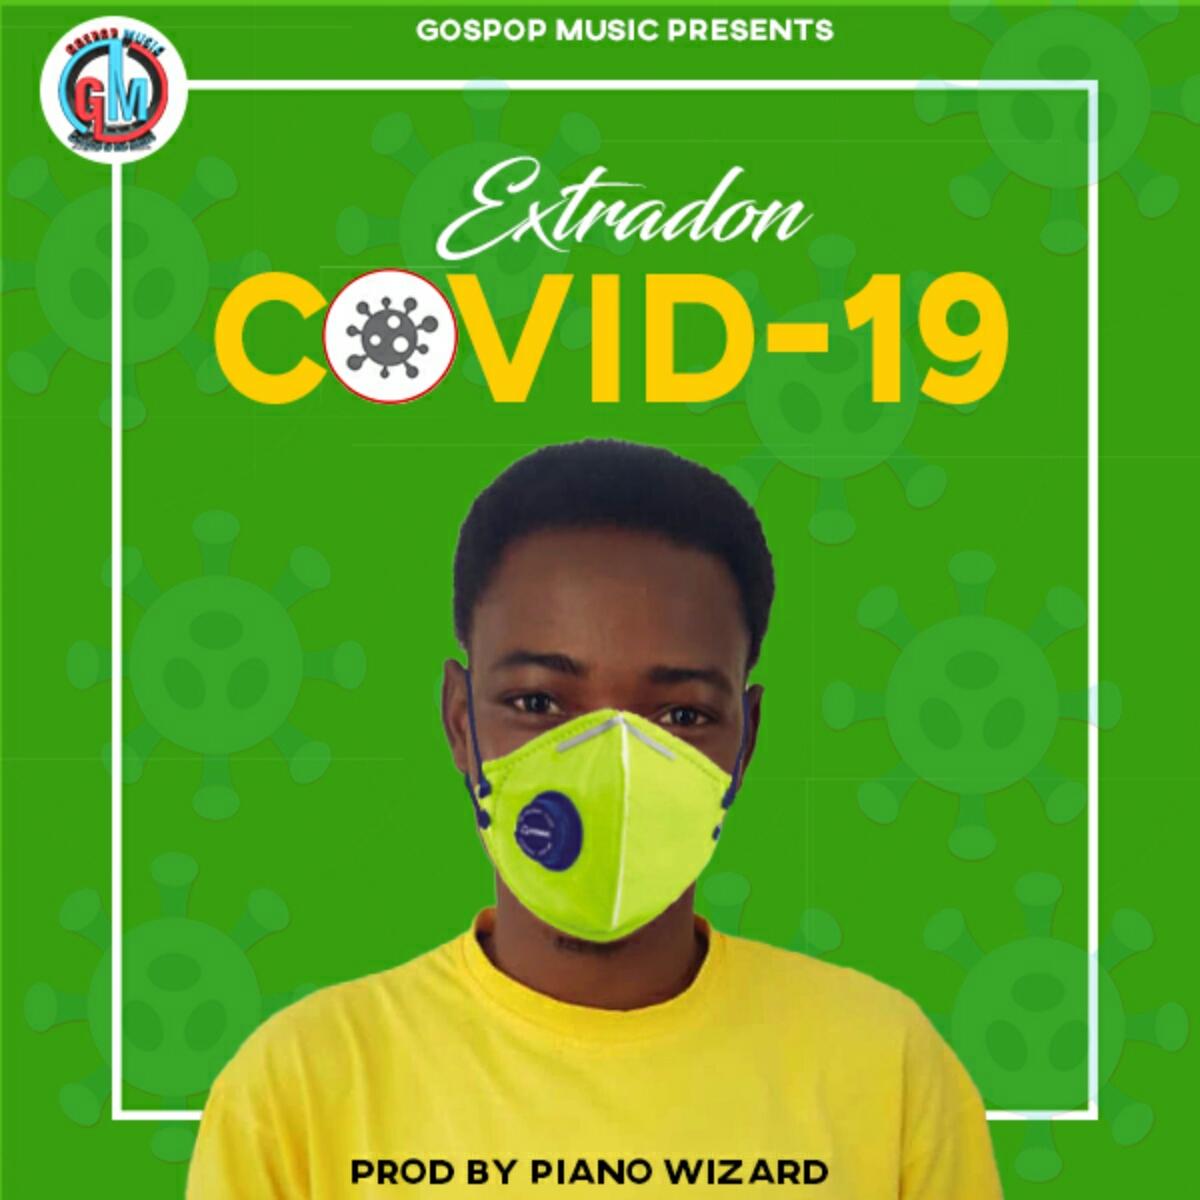 Extradon - Covid 19(Prod by Piano Wizard)